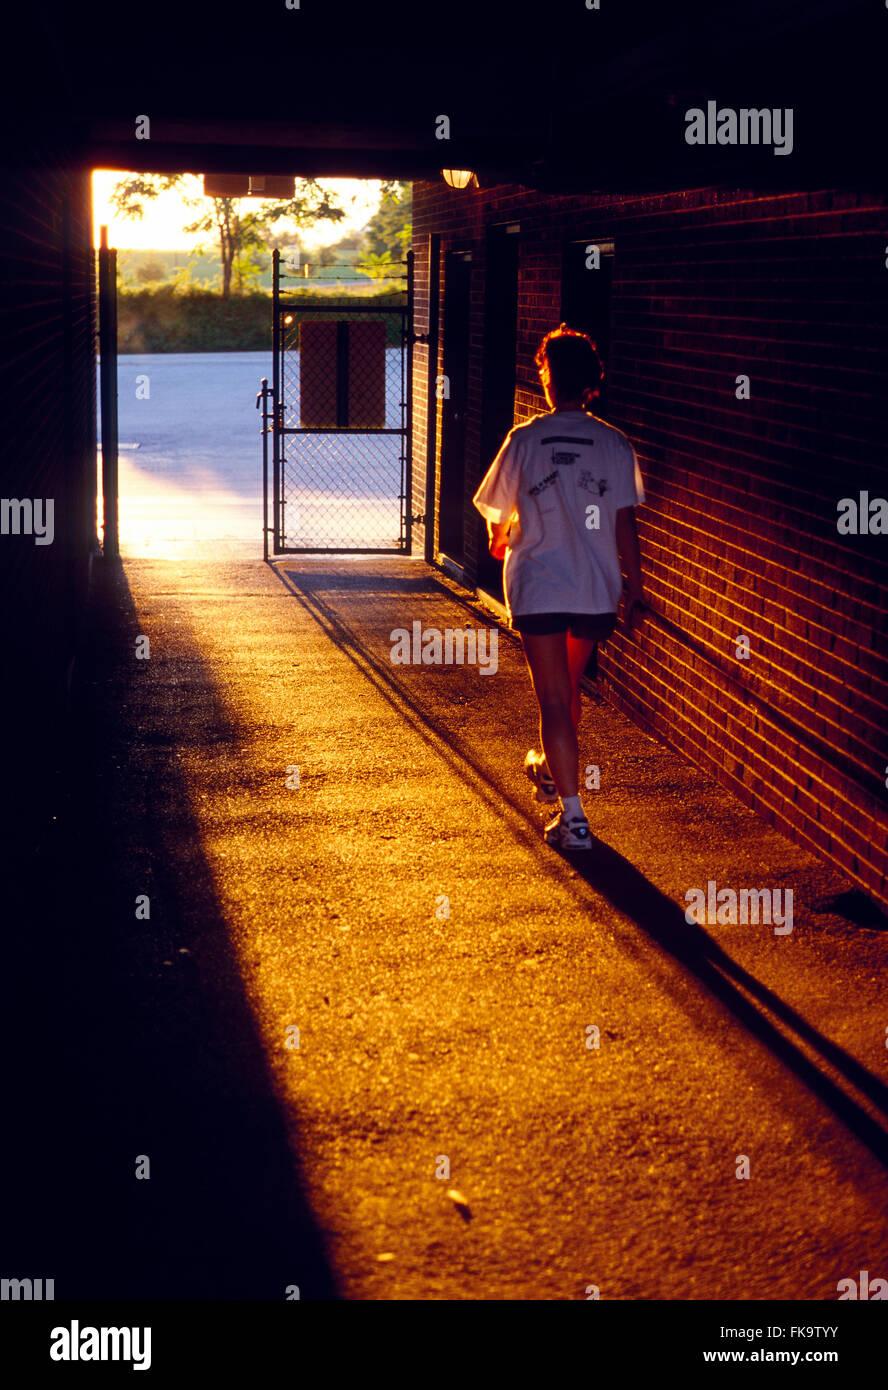 Sunset illuminates female runner leaving stadium track through tunnel - Stock Image